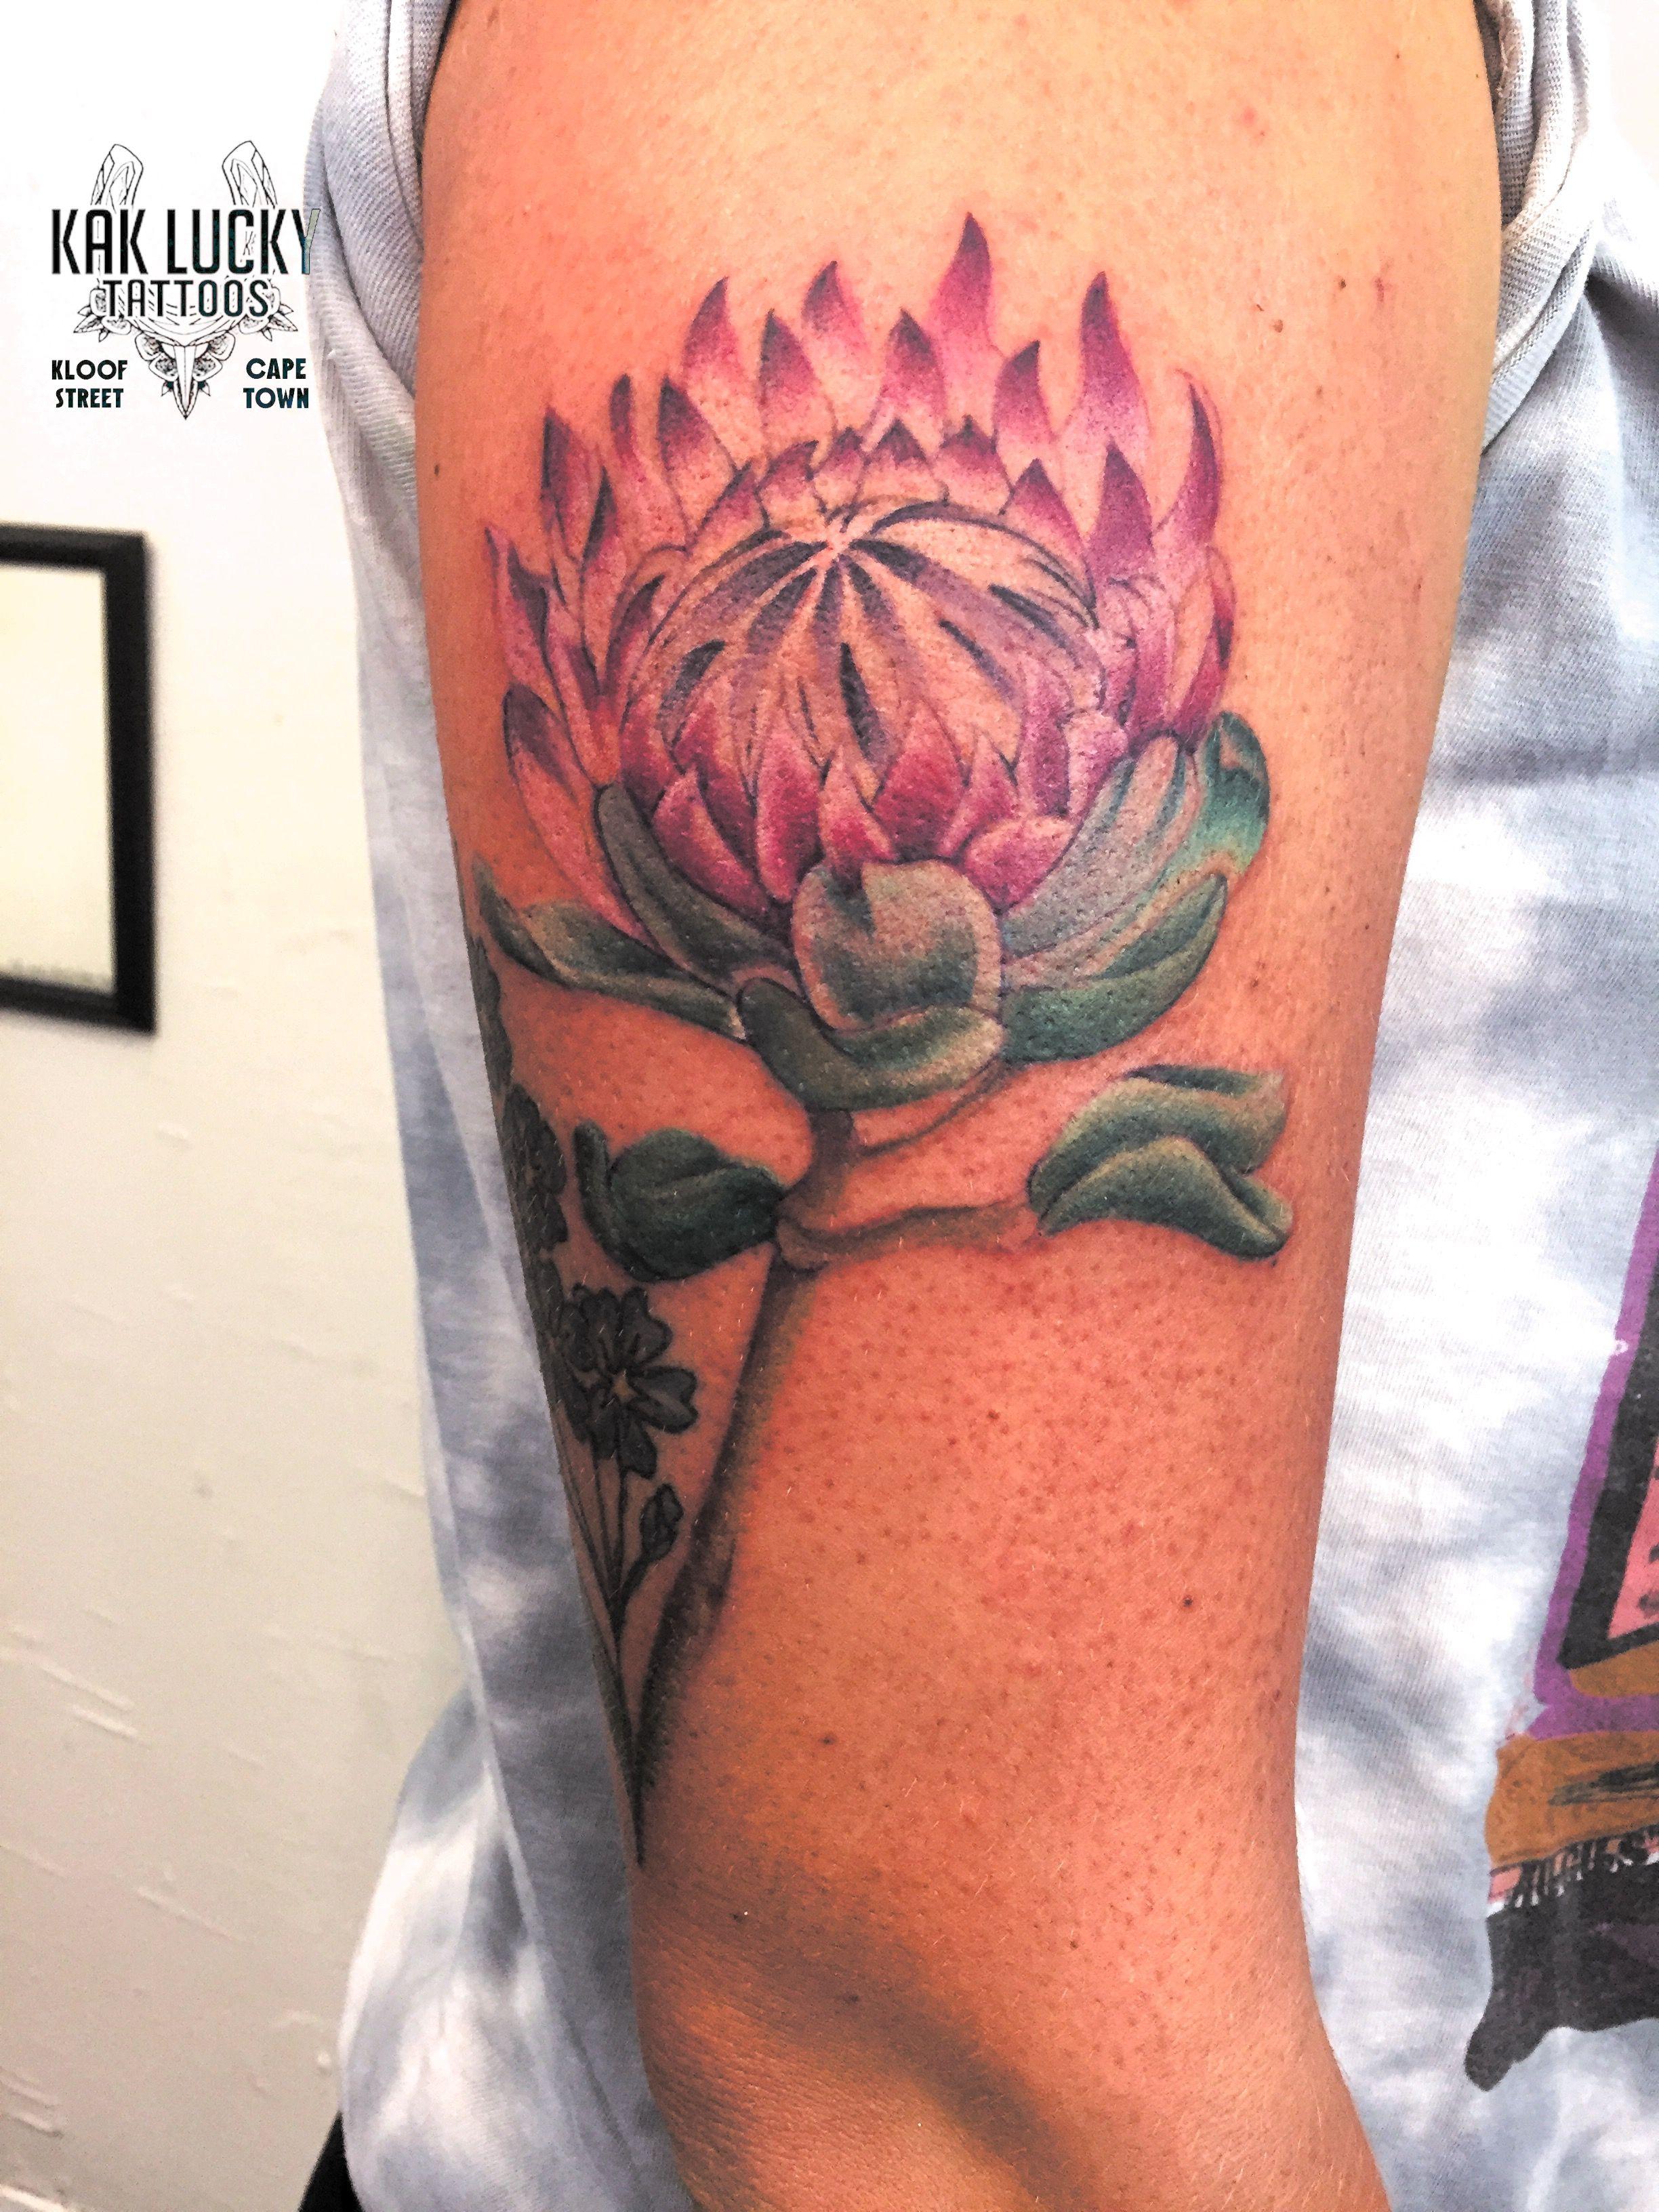 3c08401c7 Protea on Jo by @pstillen #Tattoosforwomen | Tattoos for women | Tattoos,  Tattoos for women, Native tattoos